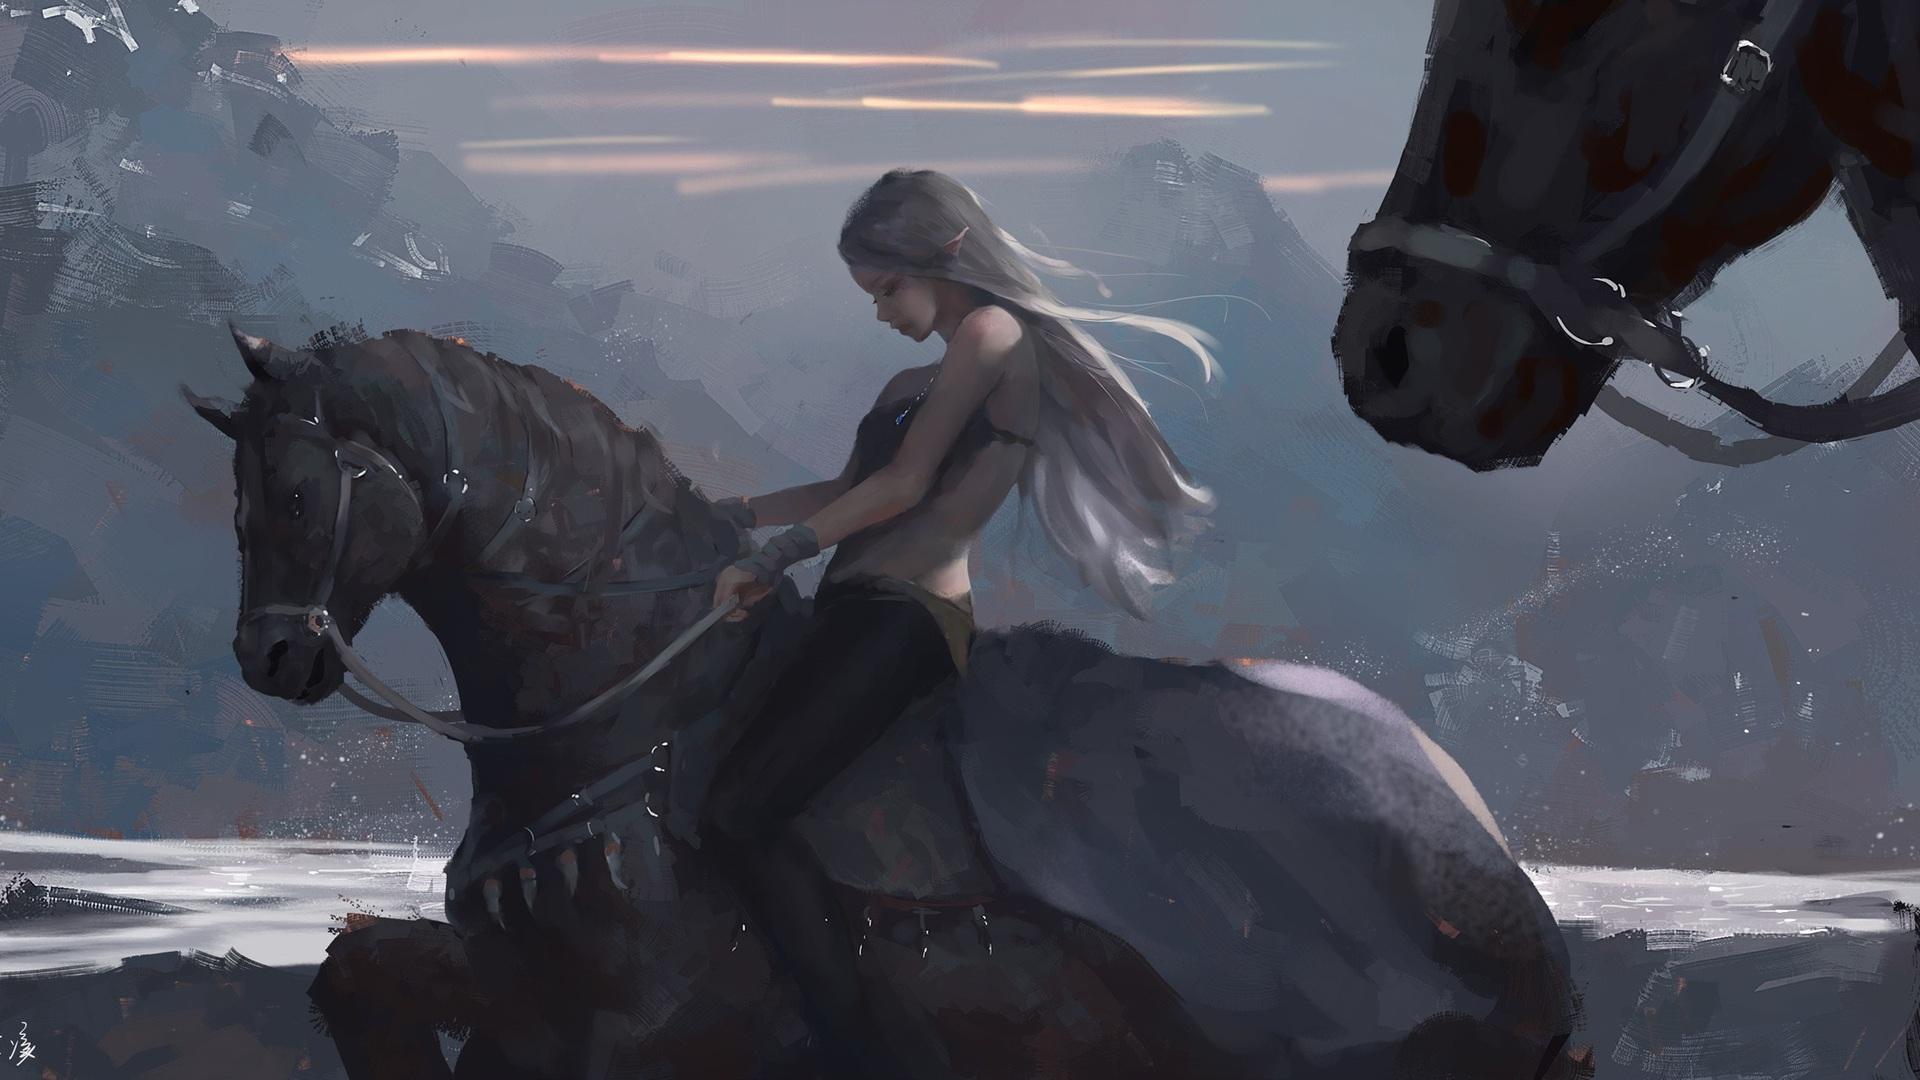 Indian Girl Wallpaper 2560x1440 Jpg 1920x1080 Long Hair Girl On Horse By Wlop Laptop Full Hd